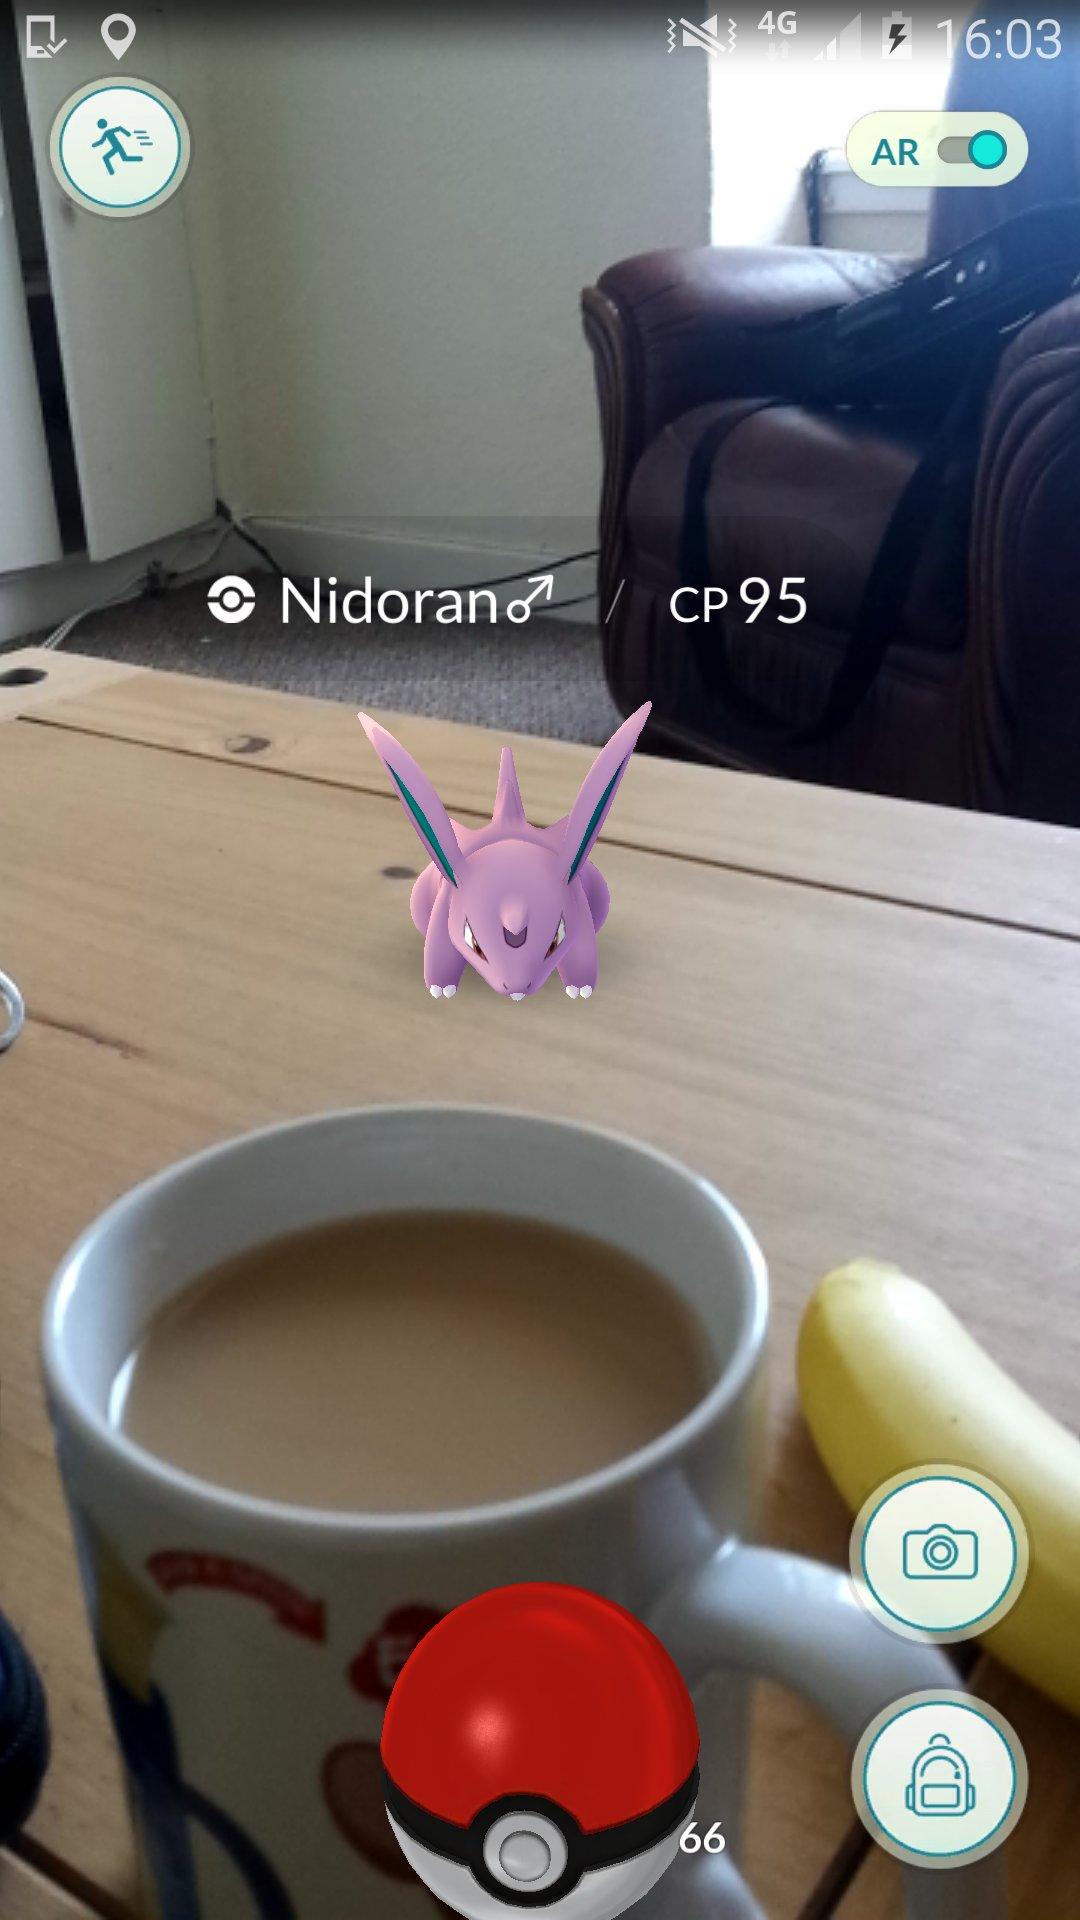 Get away from my tea! #PokemonGO #pokemon #VR #tea https://t.co/OqmHGAP3wI